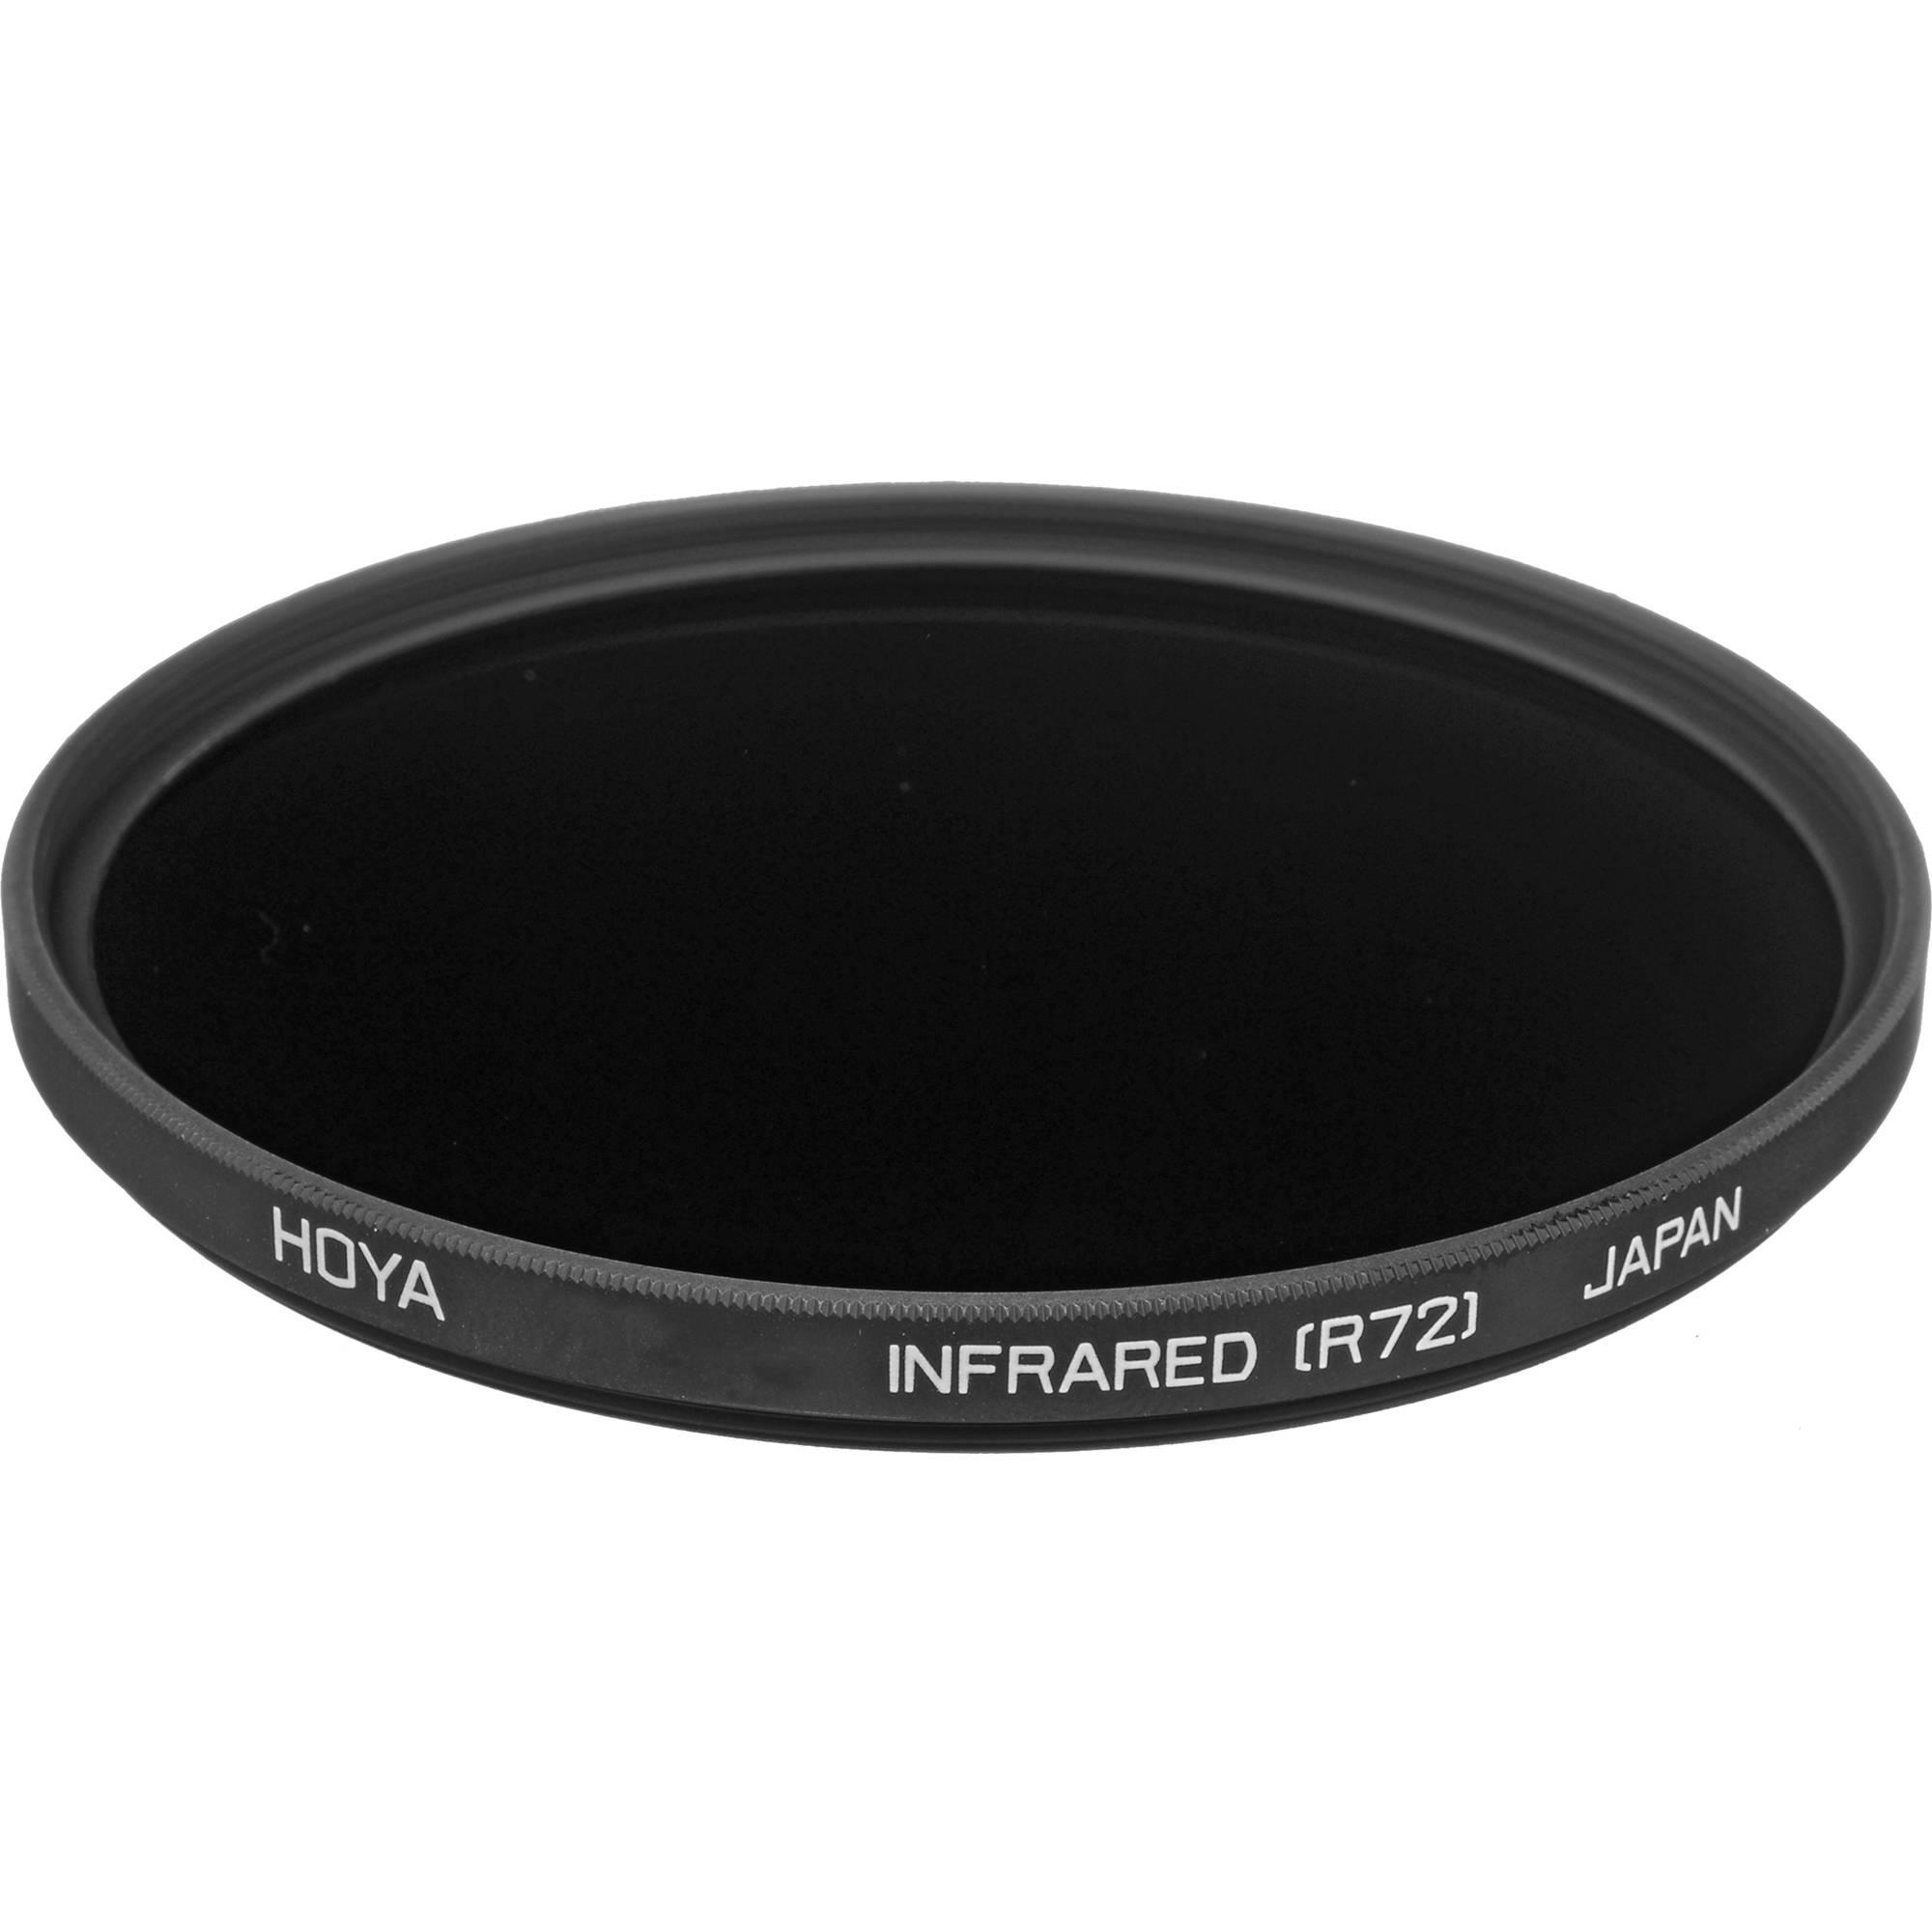 Hoya_B55RM72_55mm_R72_Infrared_Glass_23077